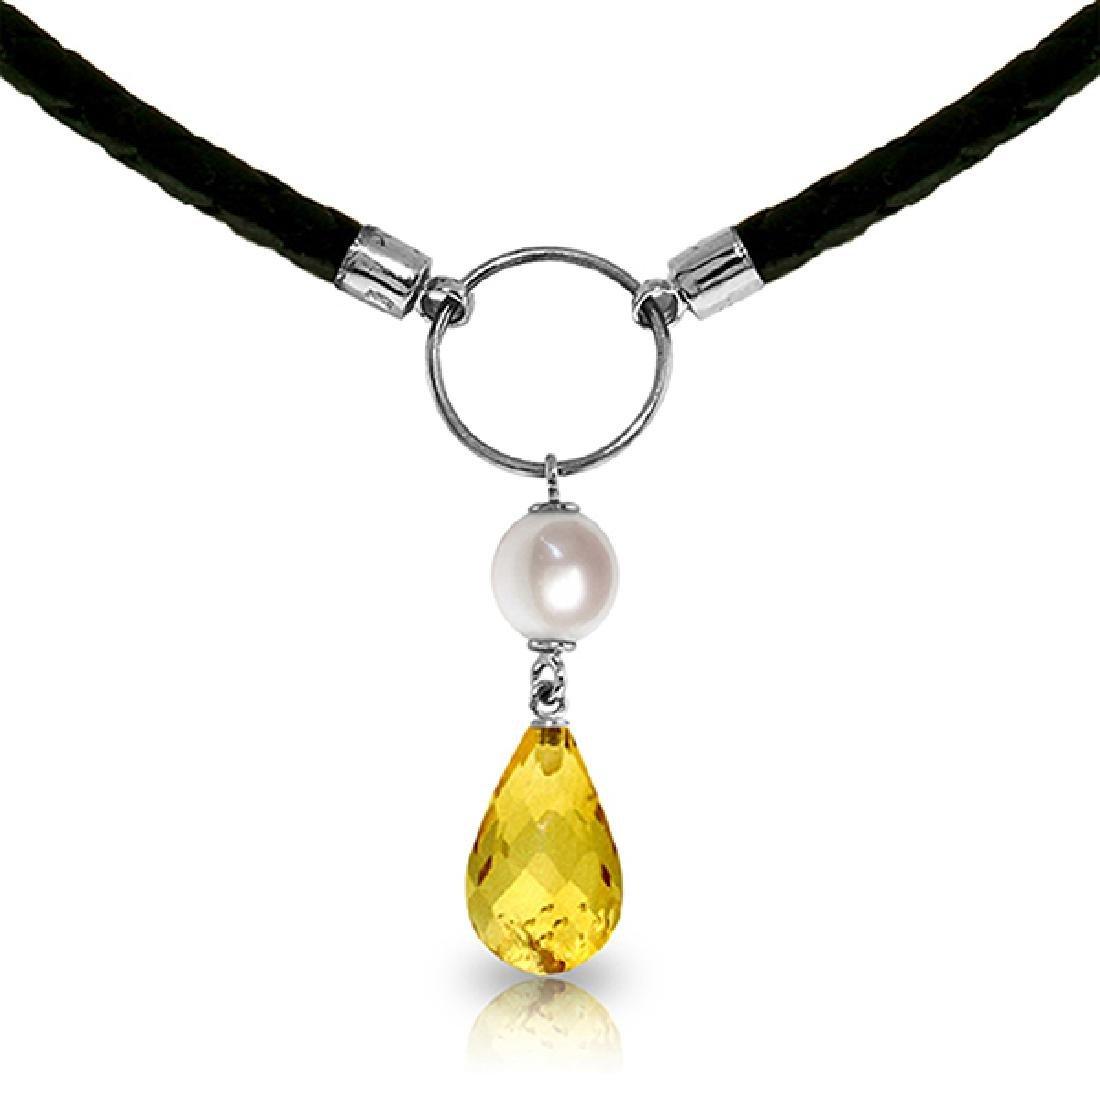 Genuine 7.5 ctw Citrine & Pearl Necklace Jewelry 14KT